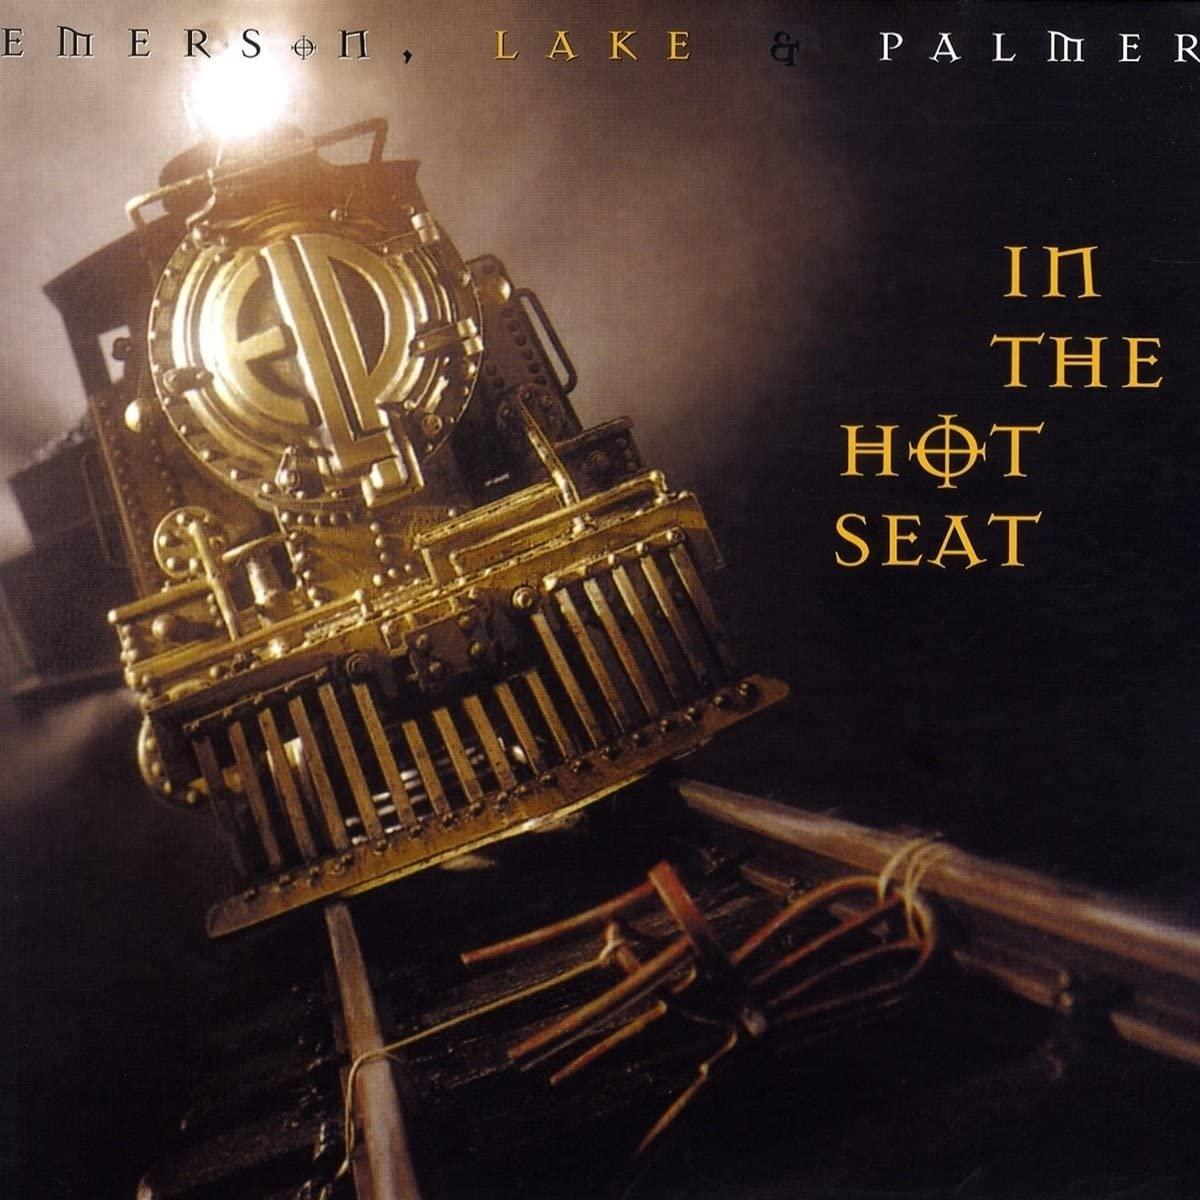 Emerson Lake Palmer Hot Seat